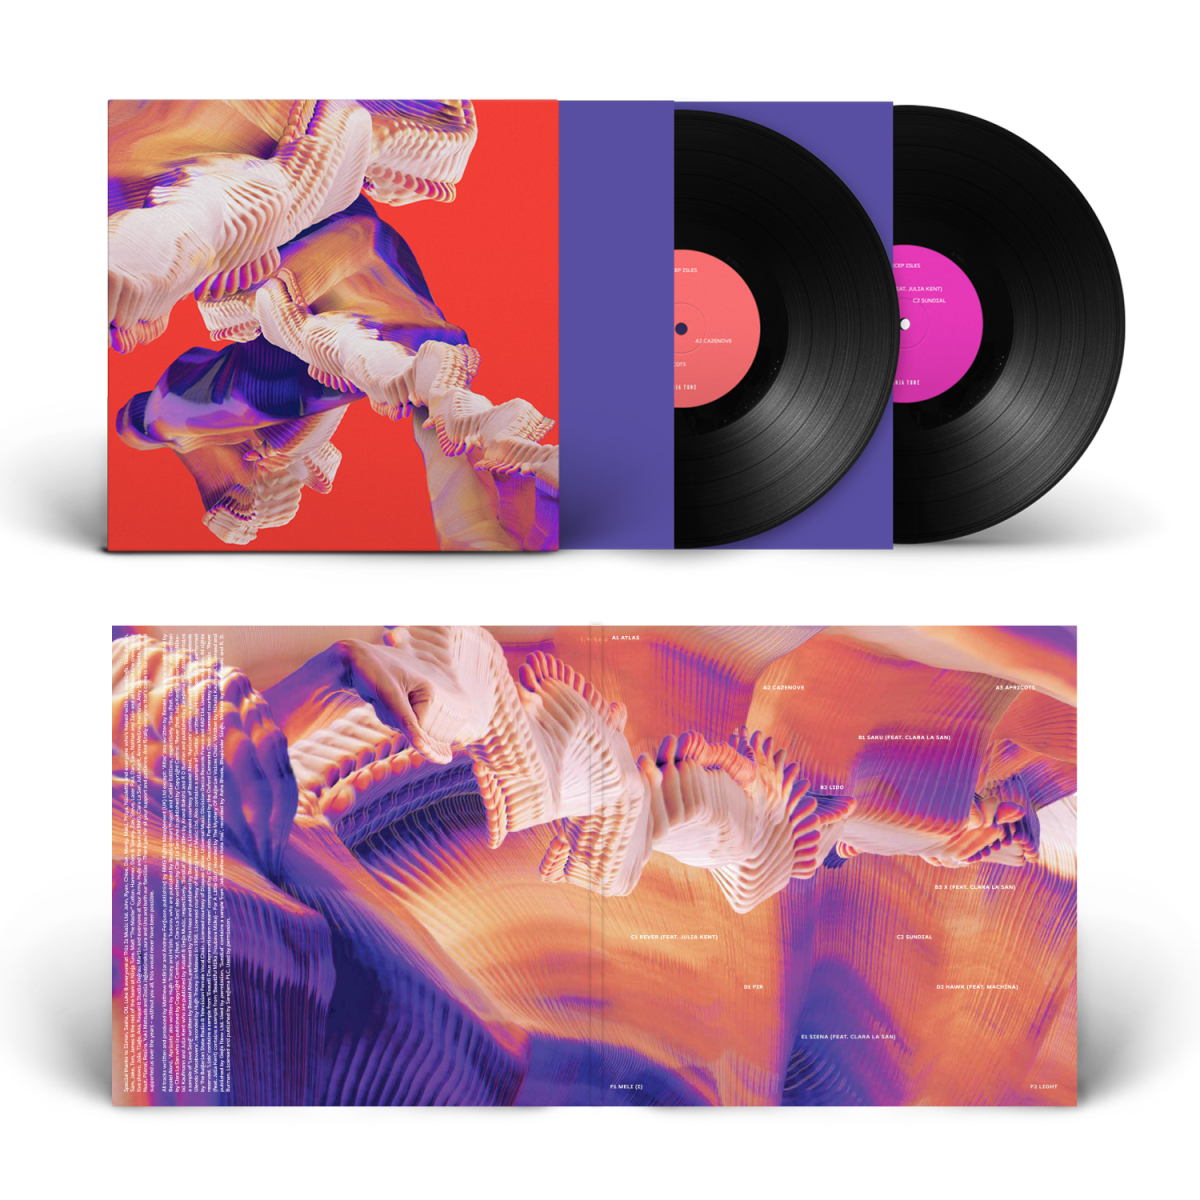 Bicep Isles Vinyl Gatefold